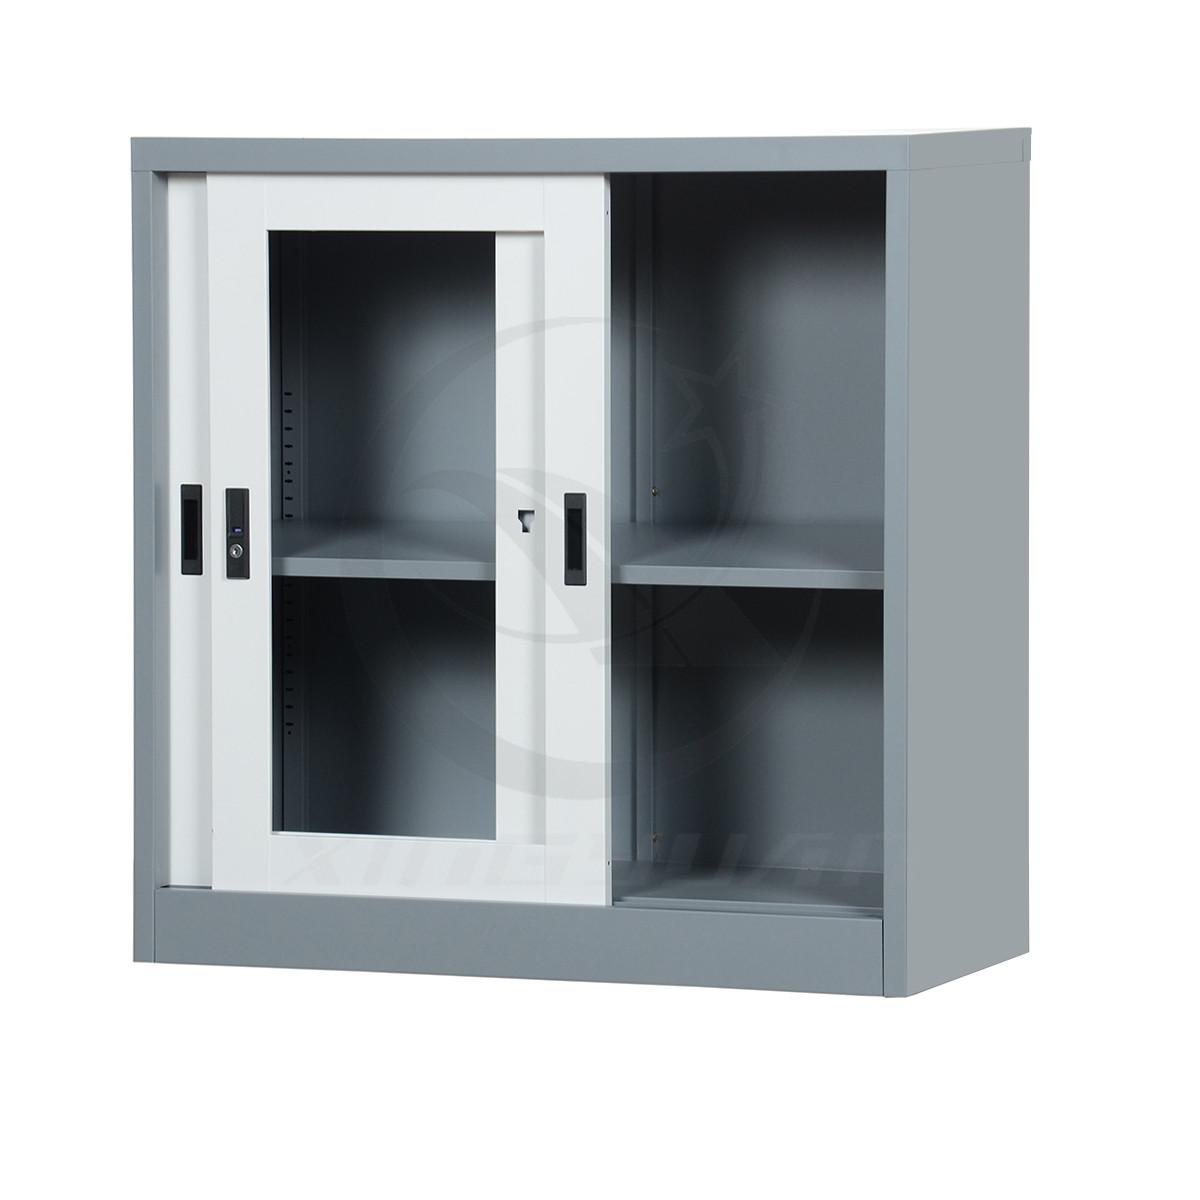 Luxury corner knock-down shoe small cabinet with sliding door